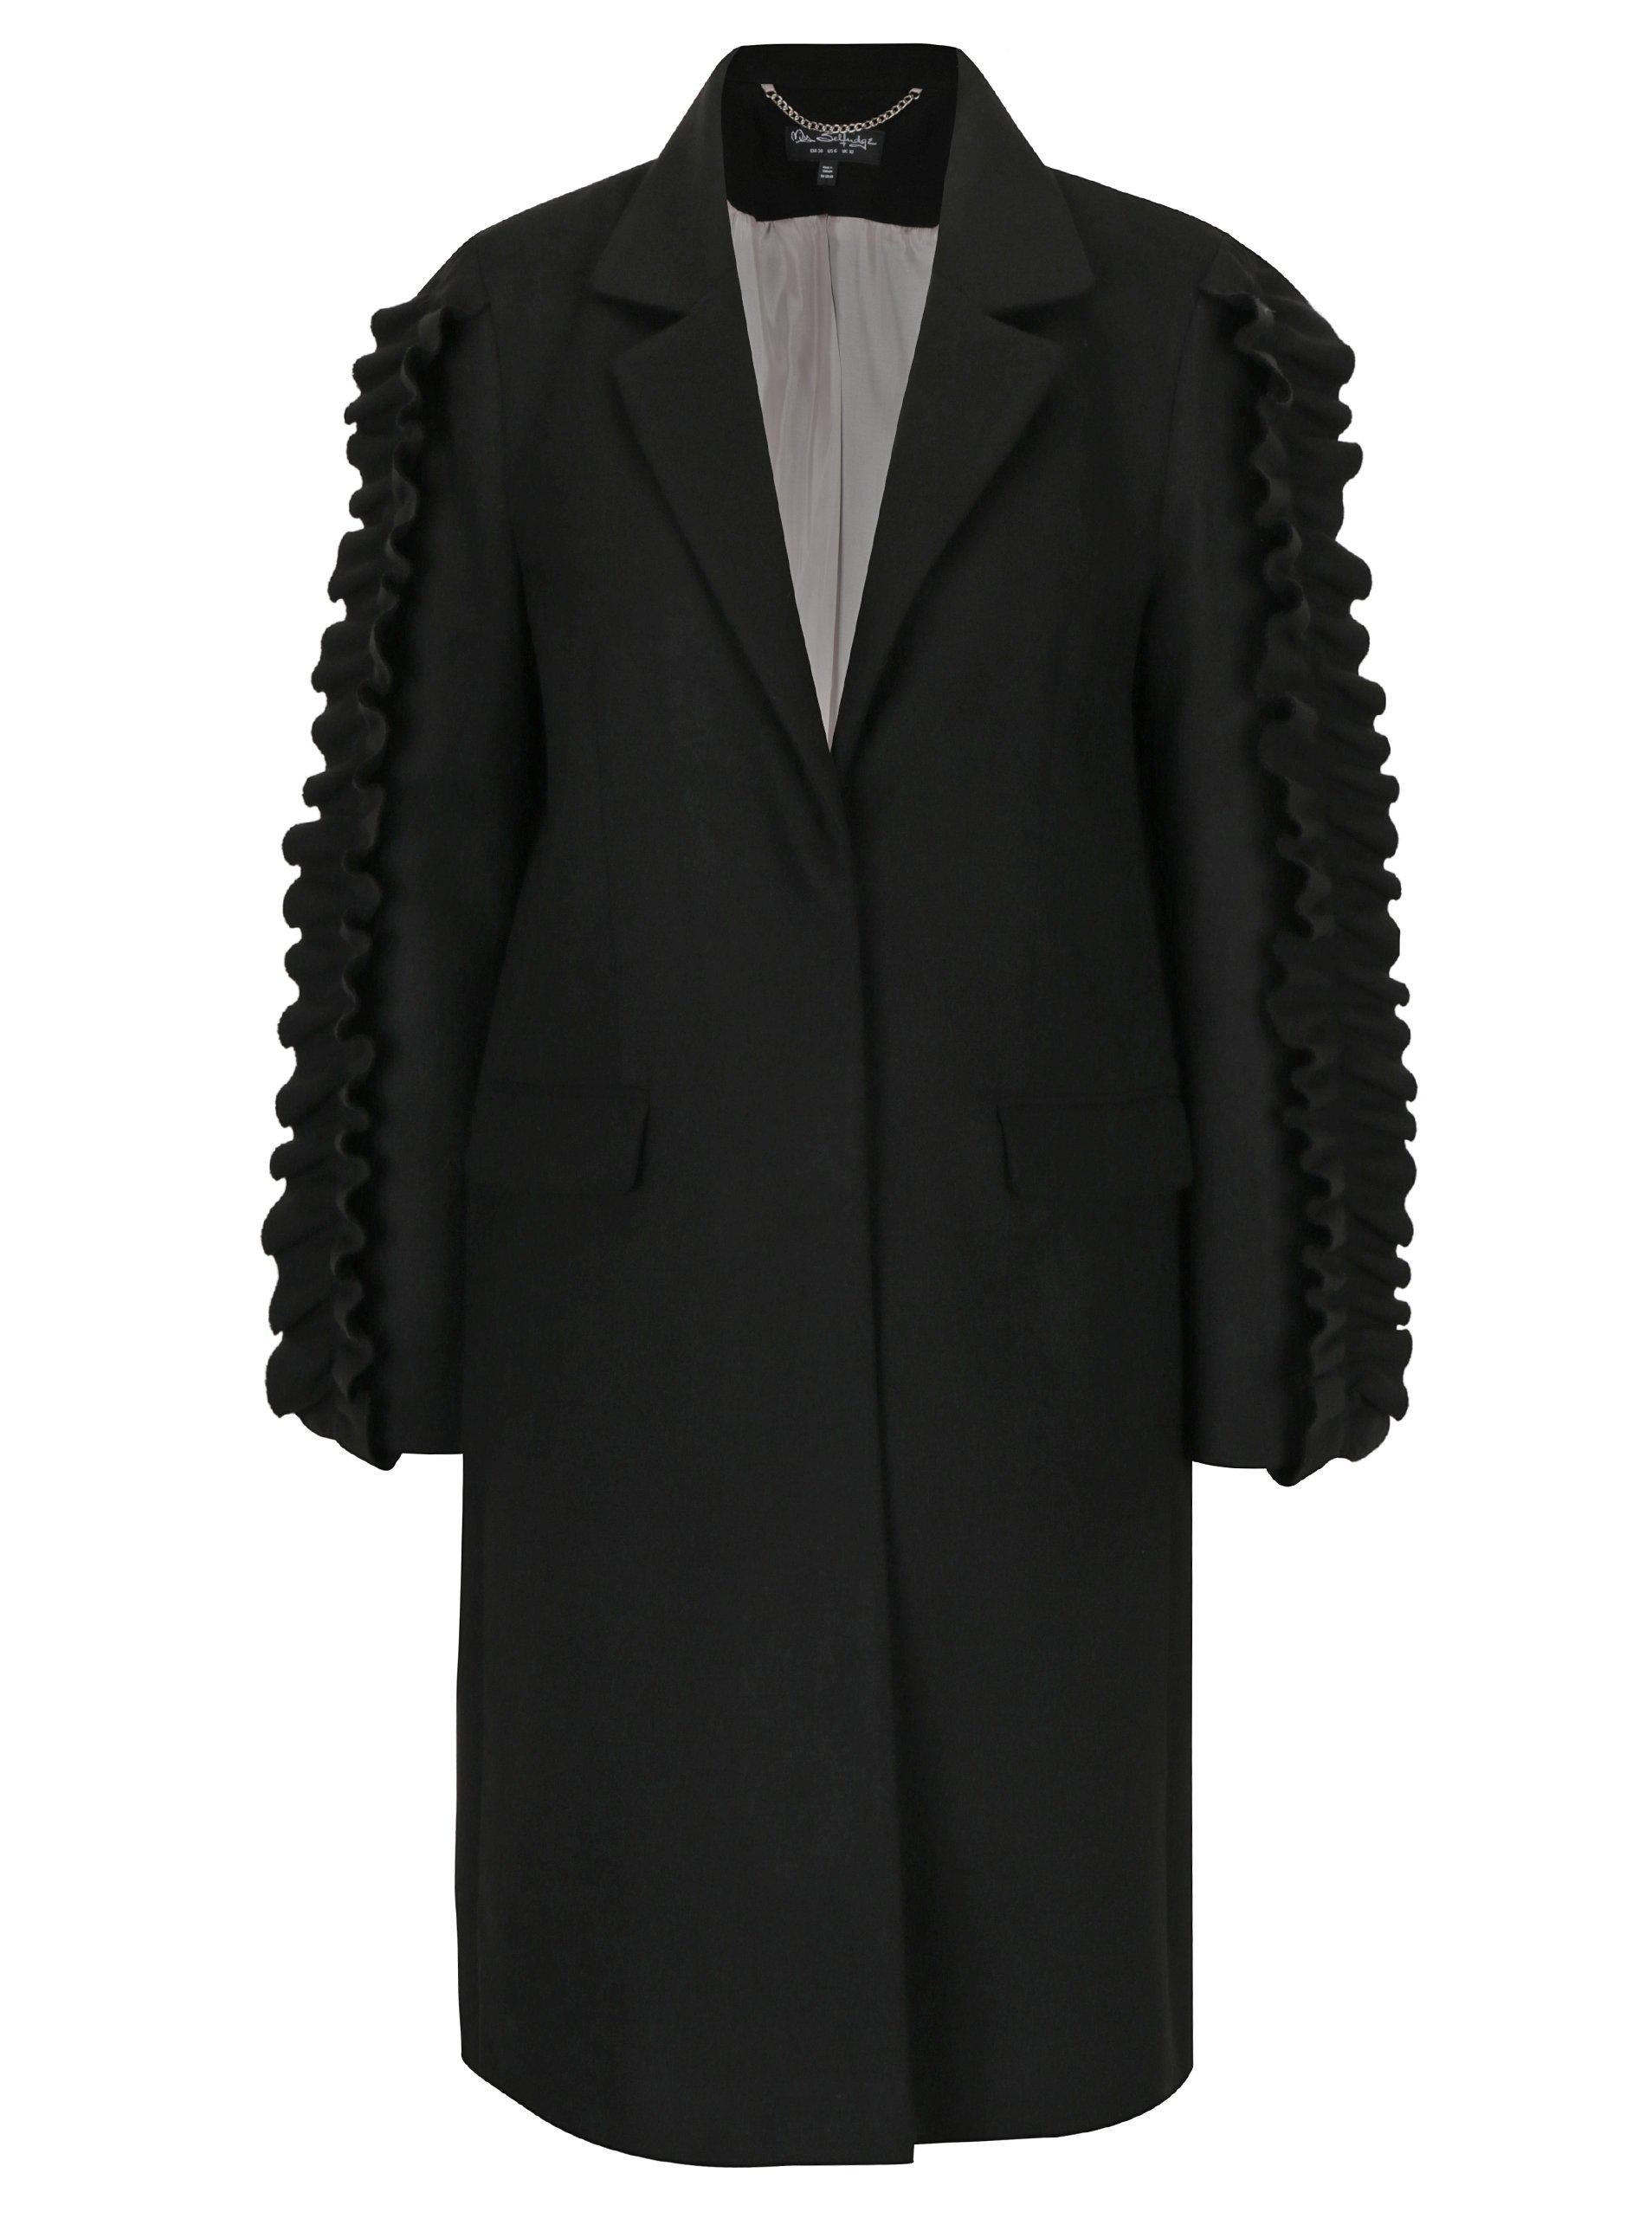 Čierny kabát s volánmi na rukávoch Miss Selfridge